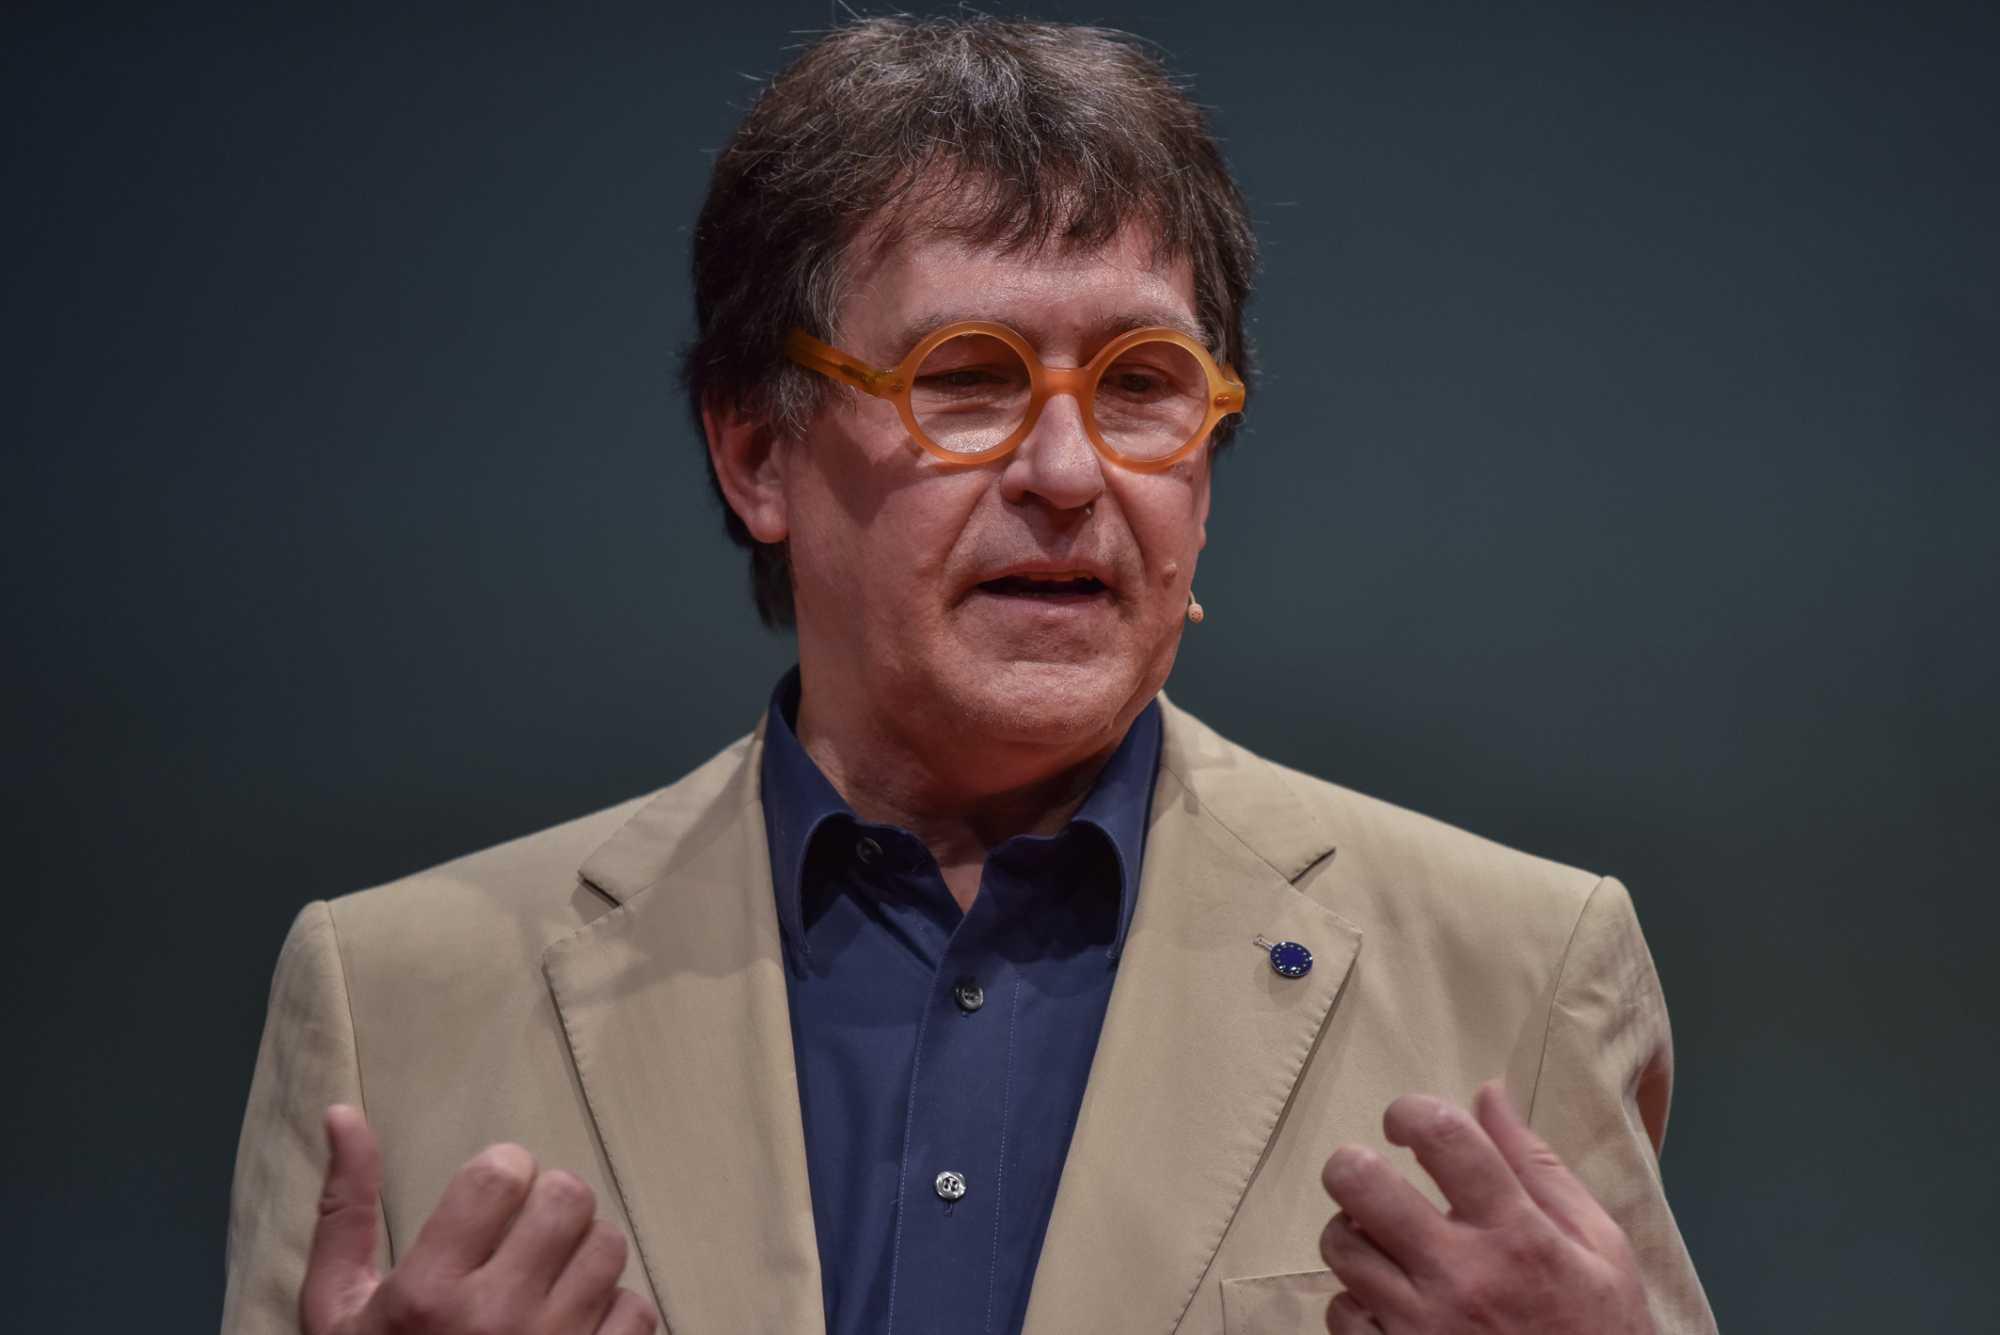 Georg Markus Kainz